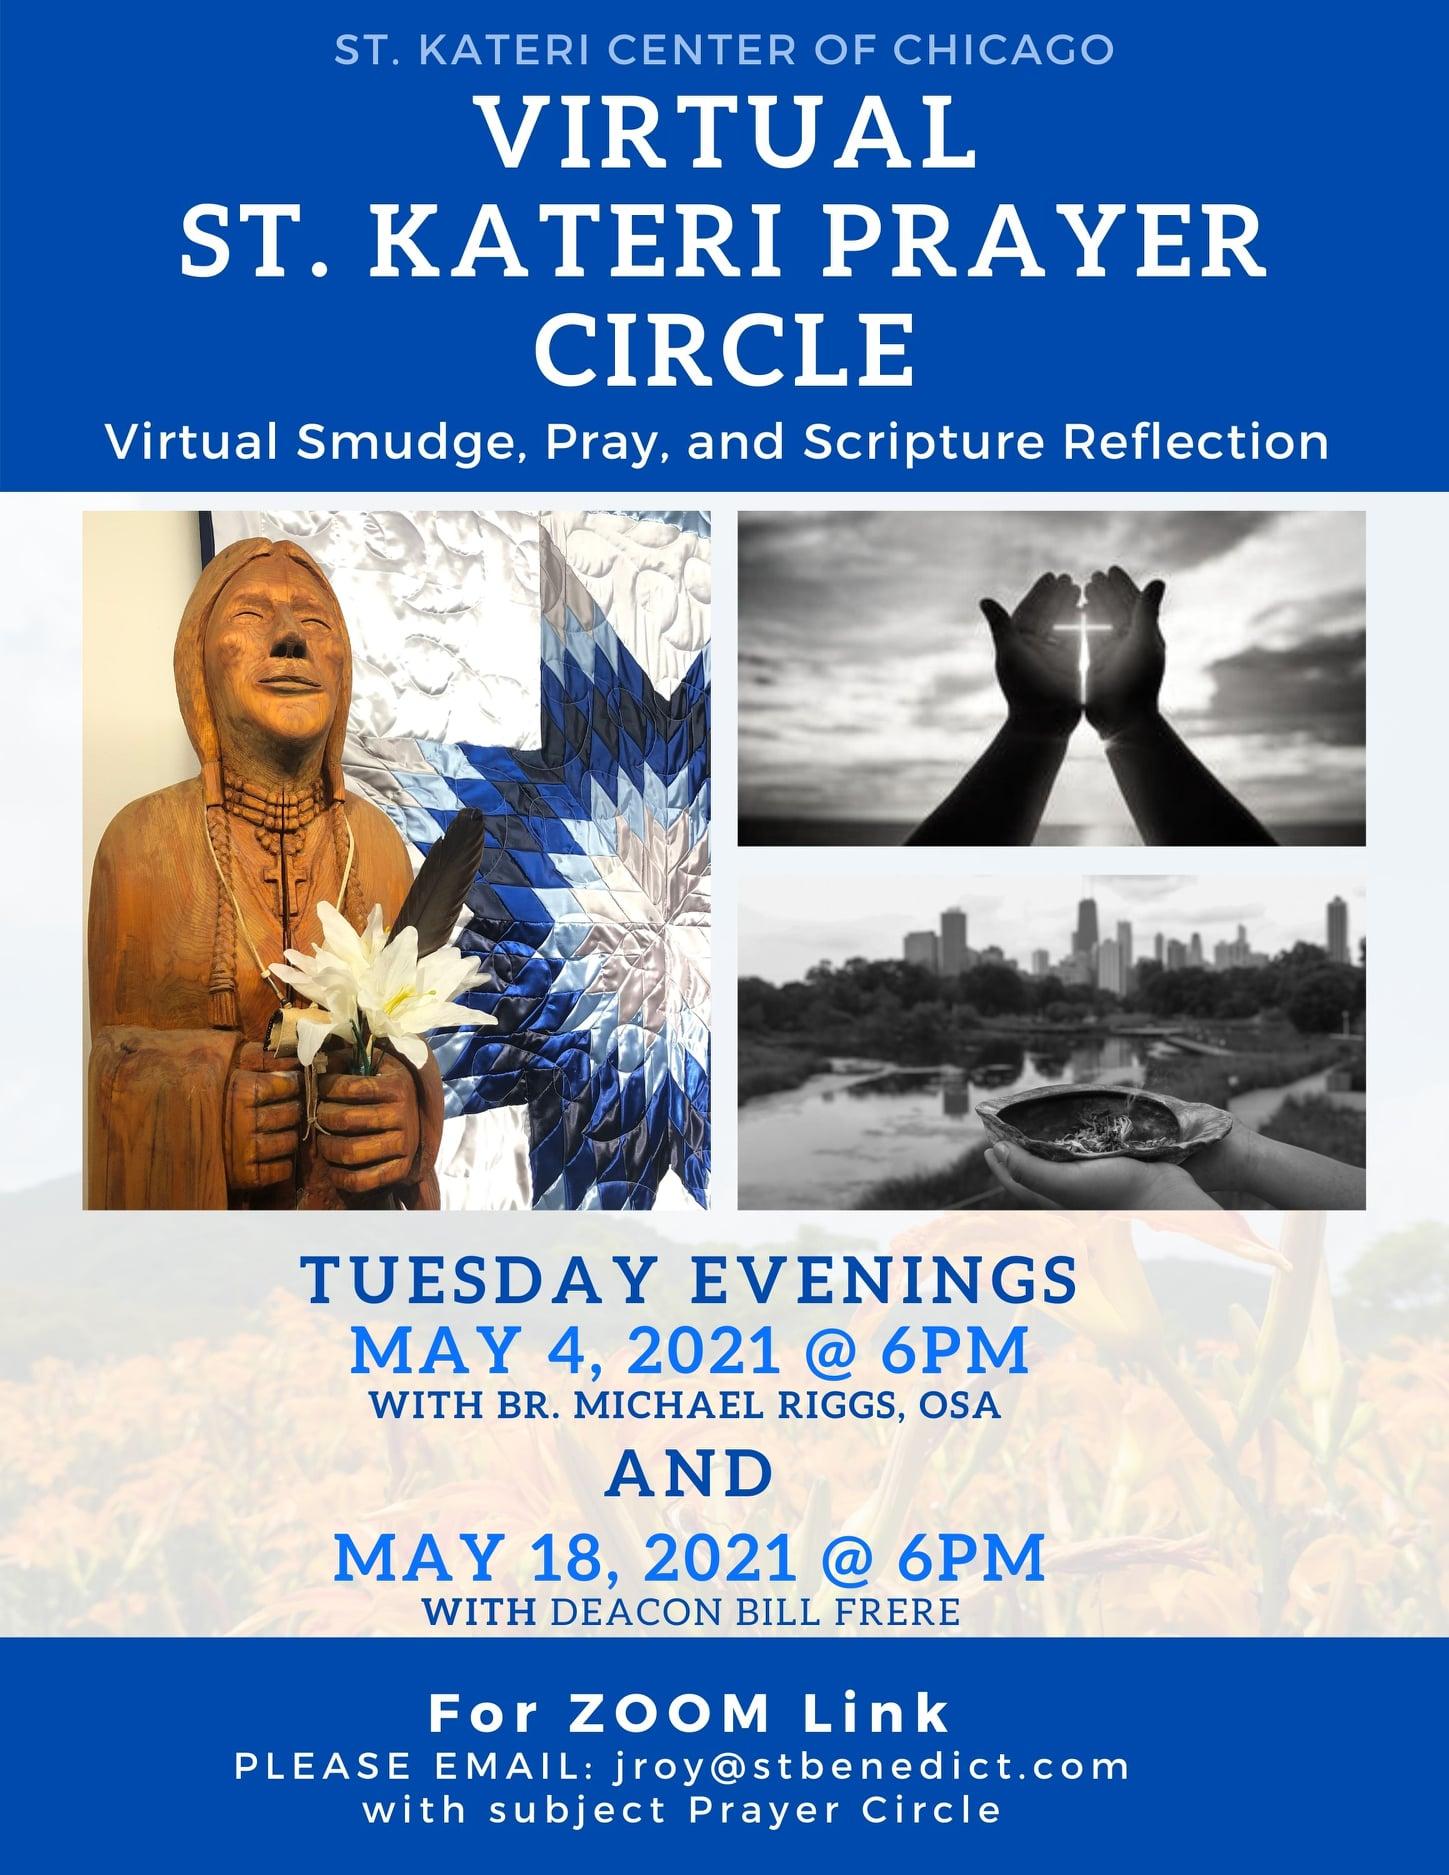 St. Kateri Prayer Circle Flyer